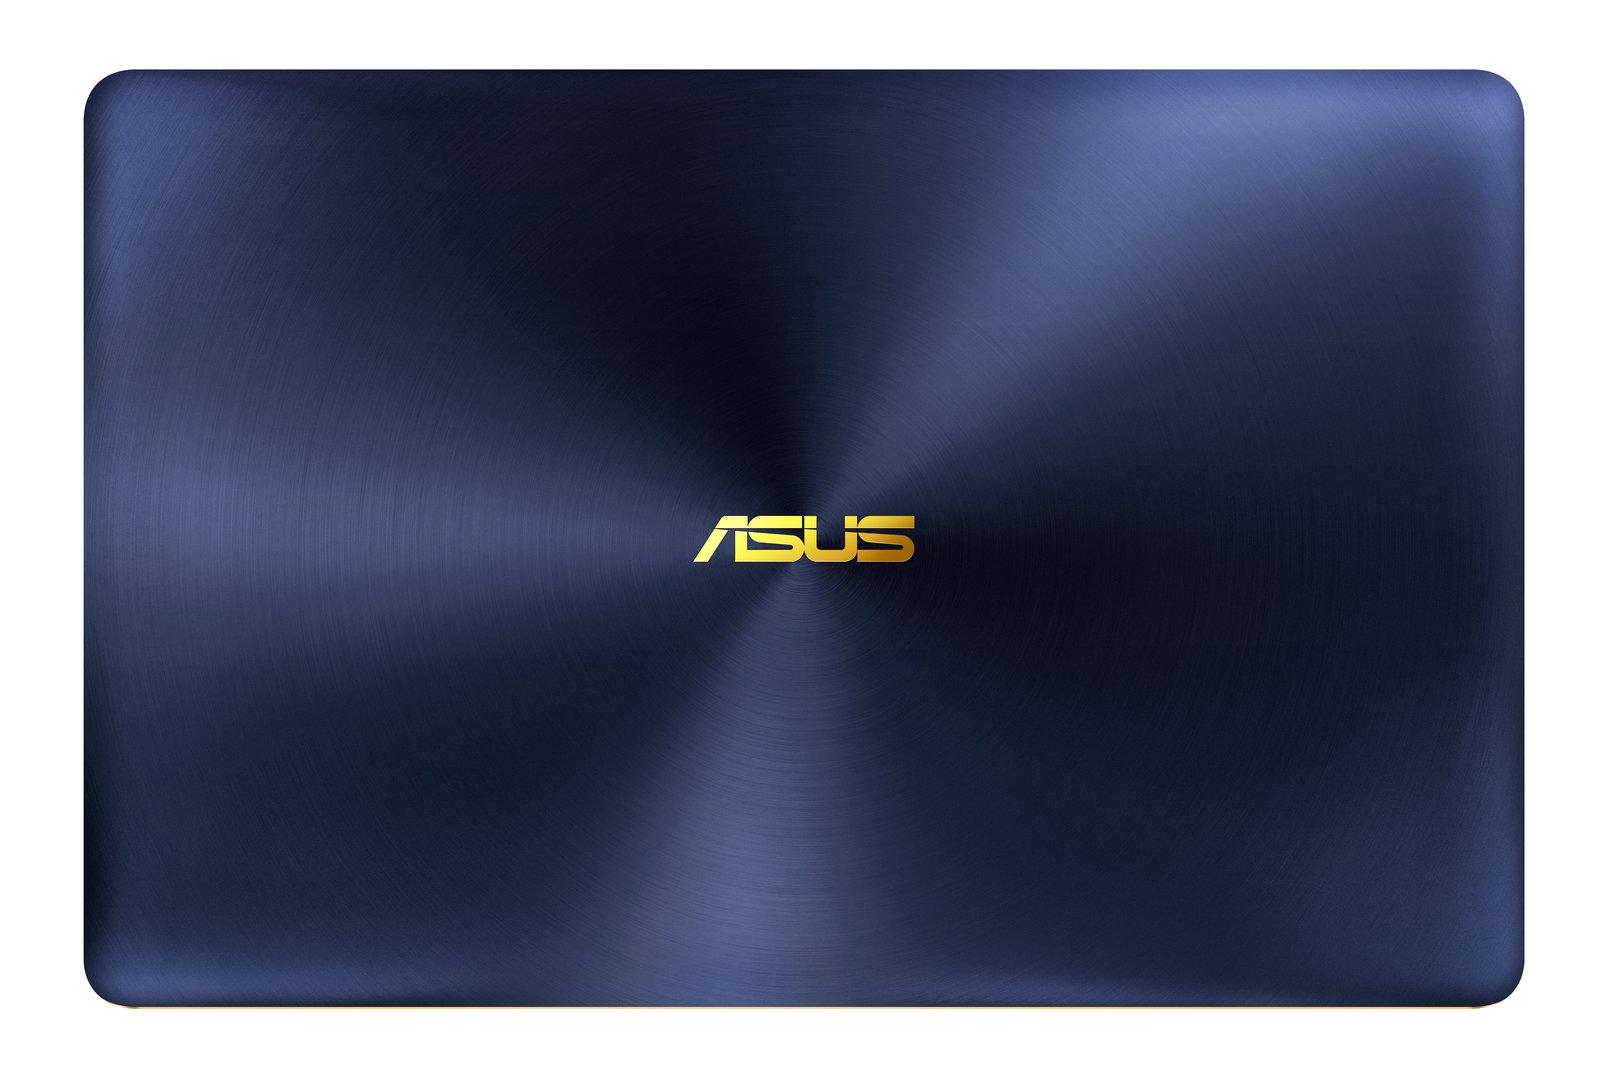 Asus Zenbook 3 Deluxe Royal Blue